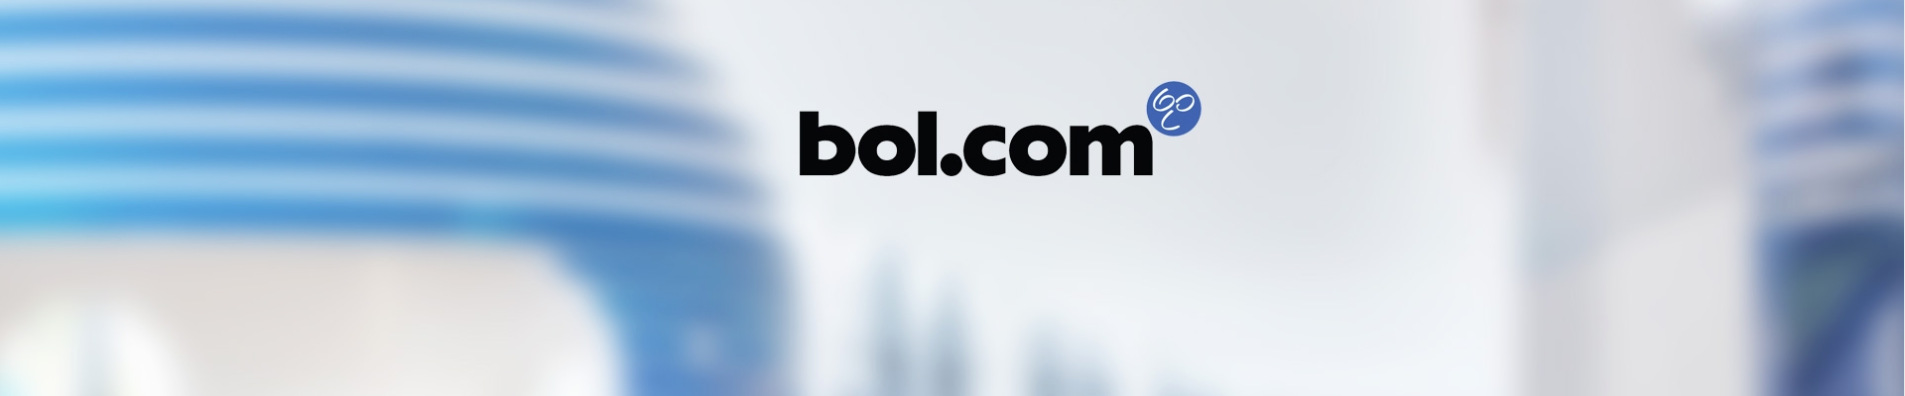 Afbeelding bol.com logo